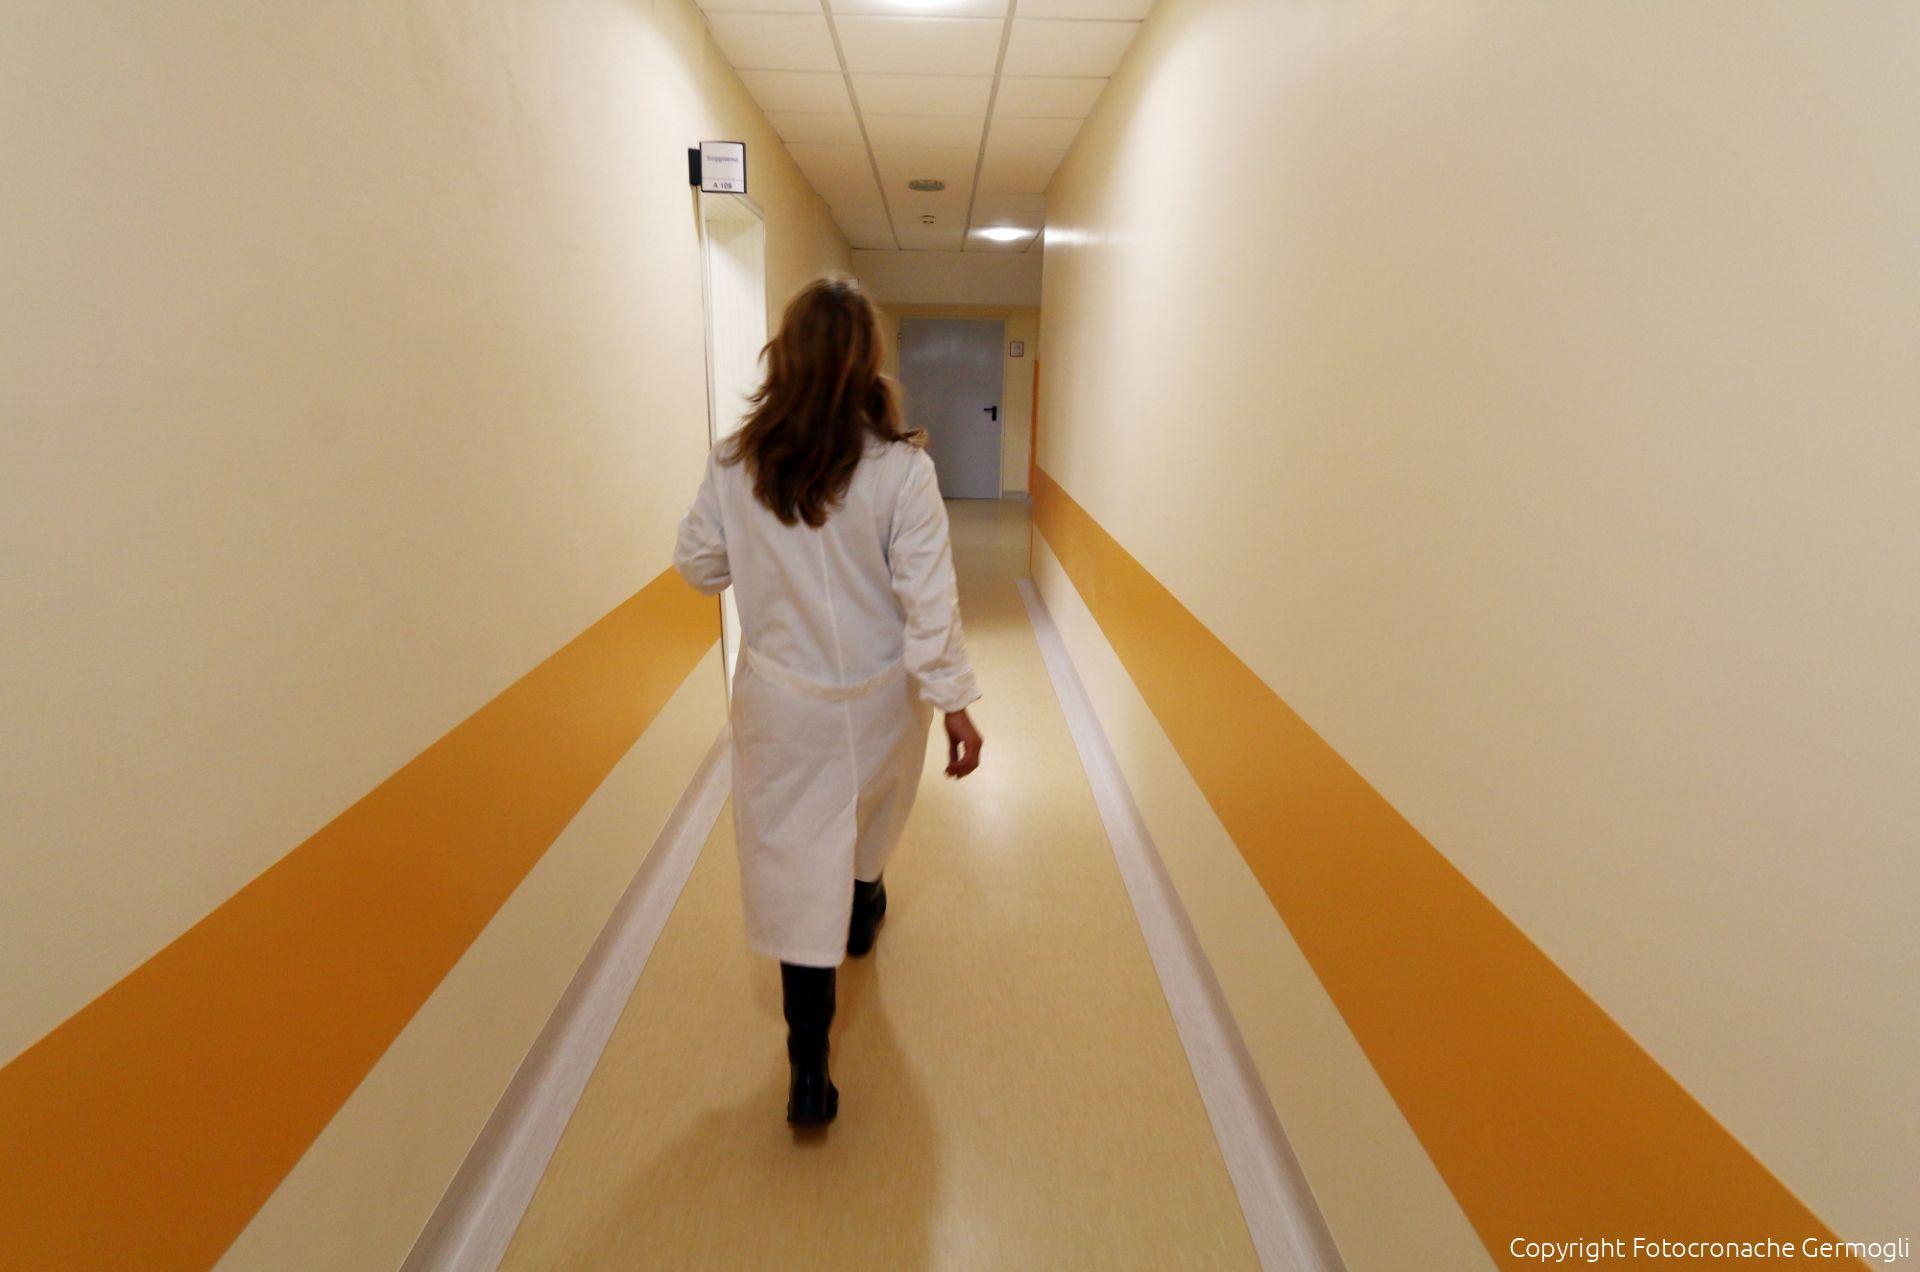 TOSCANA, 52 nuovi casi di Covid-19. 16 i decessi